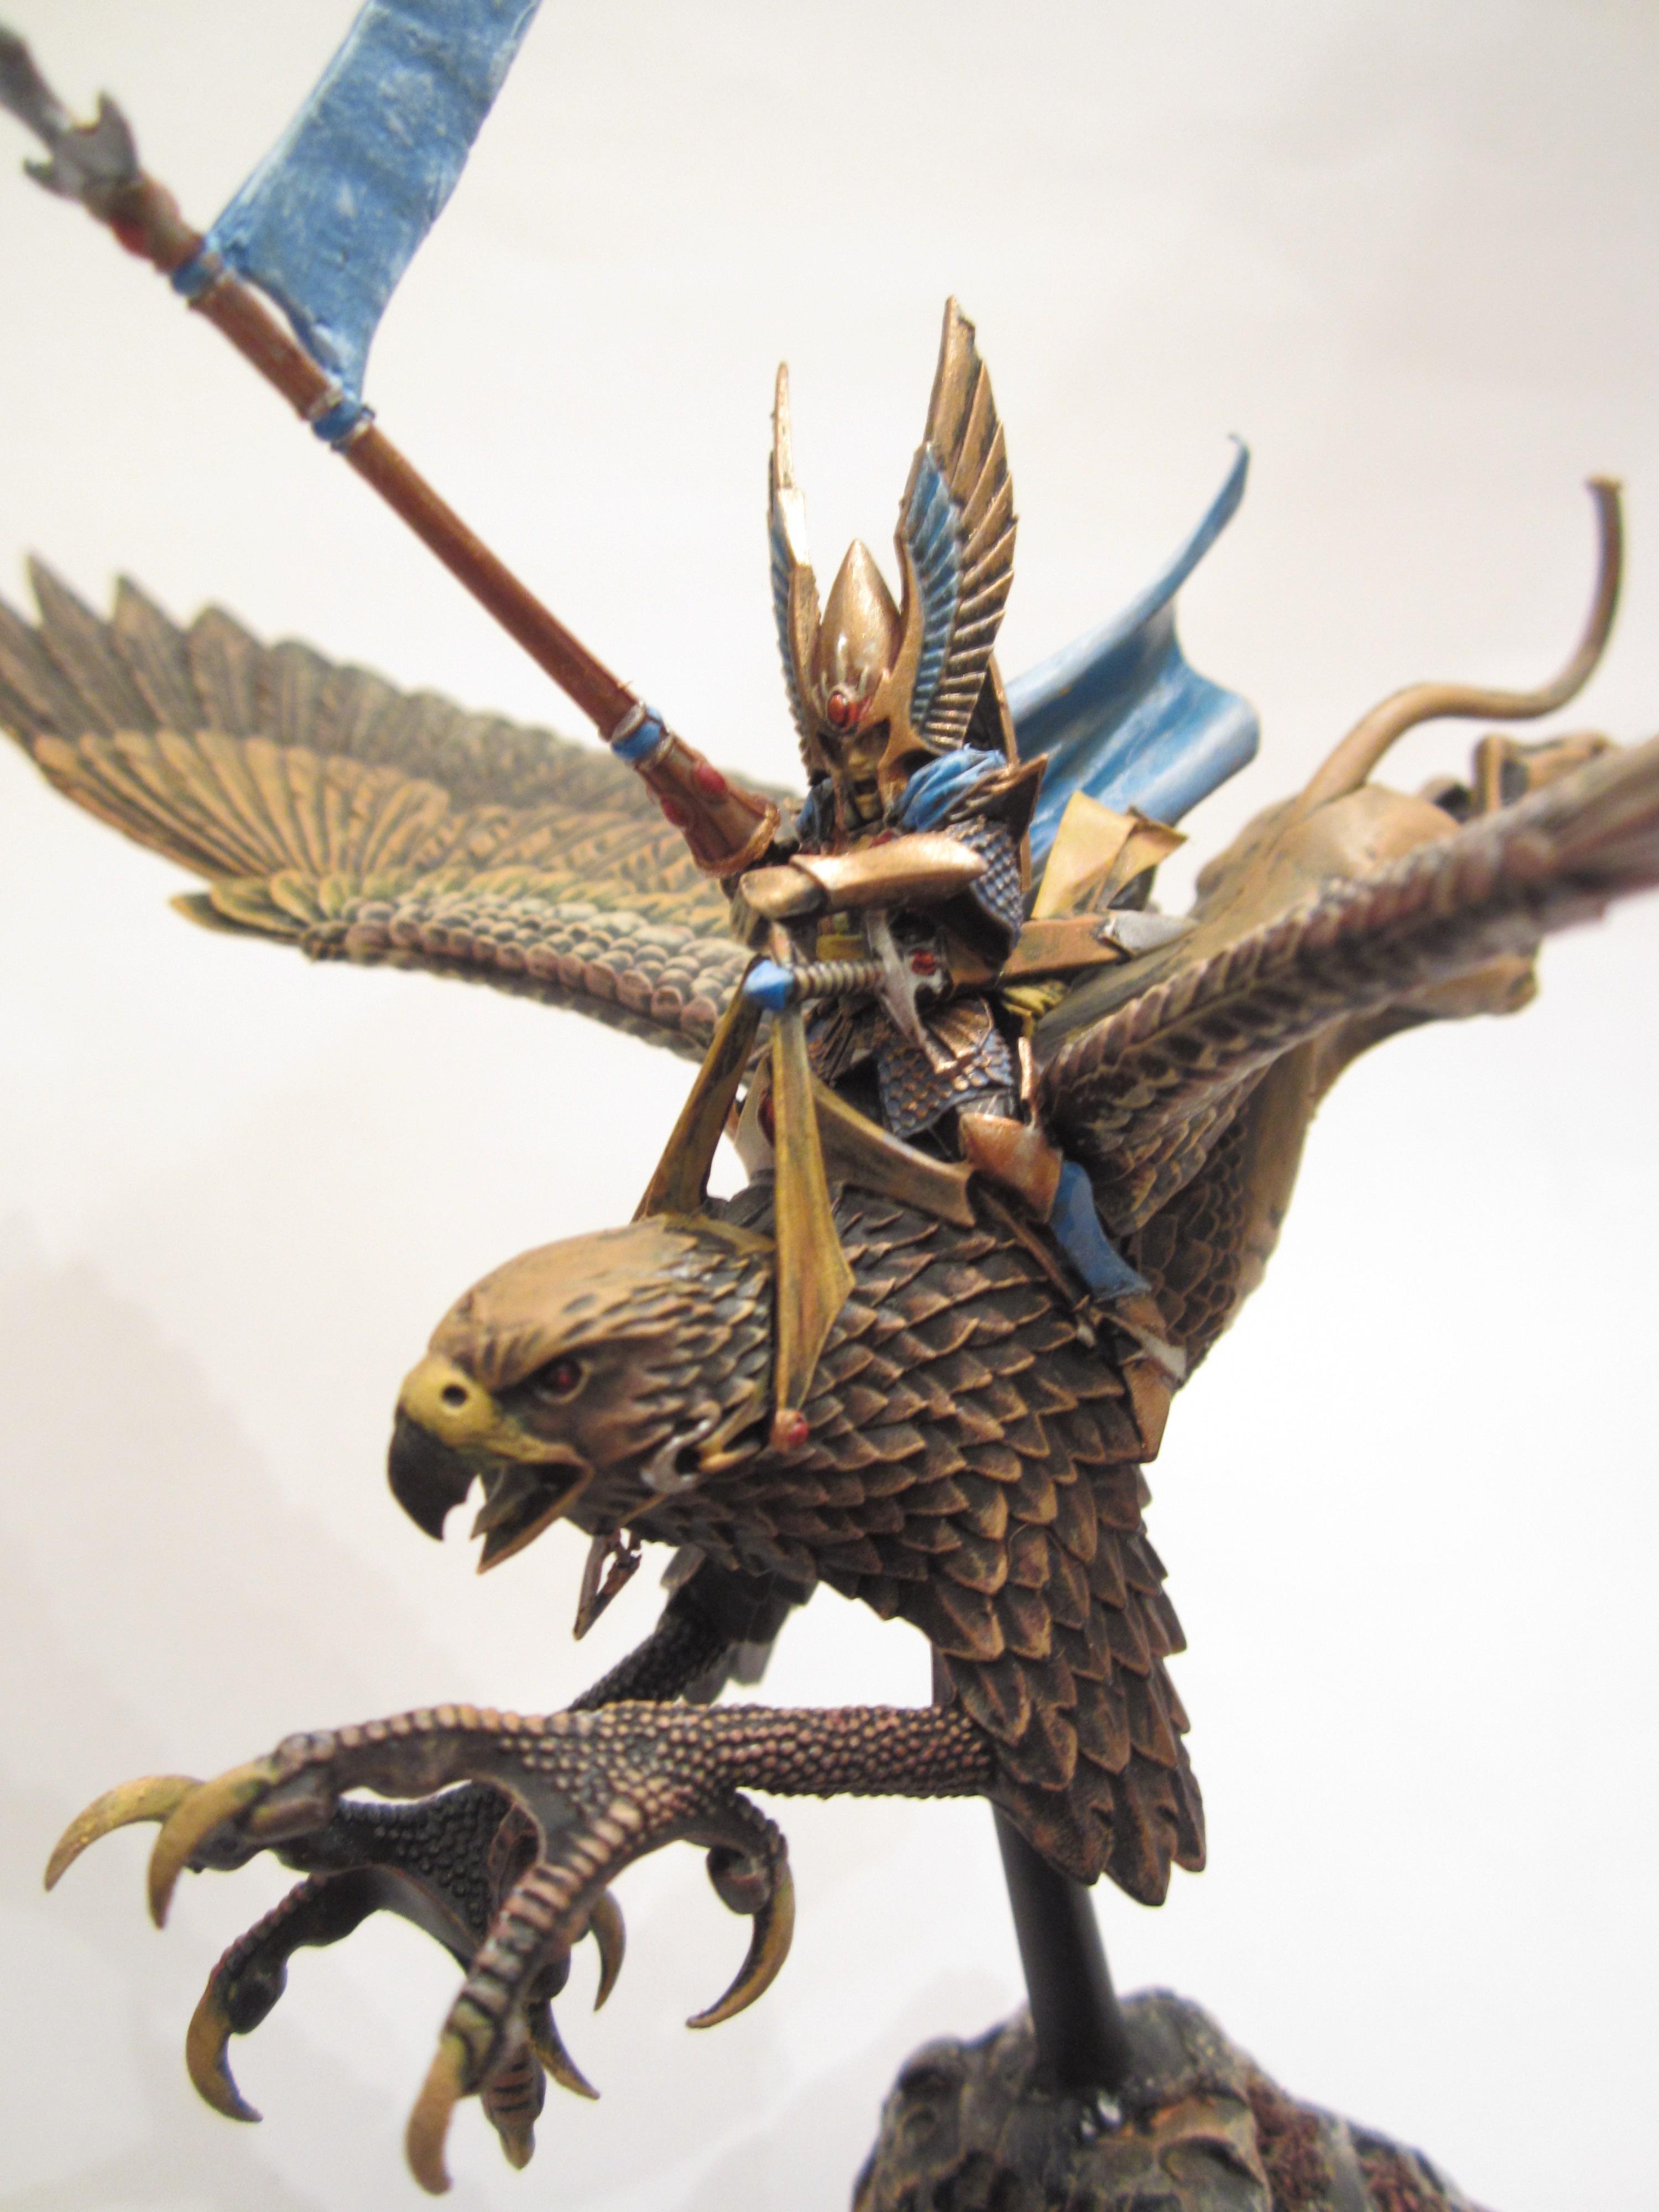 Conversion, High Elves, Orks, Warhammer 40,000, Warhammer Fantasy